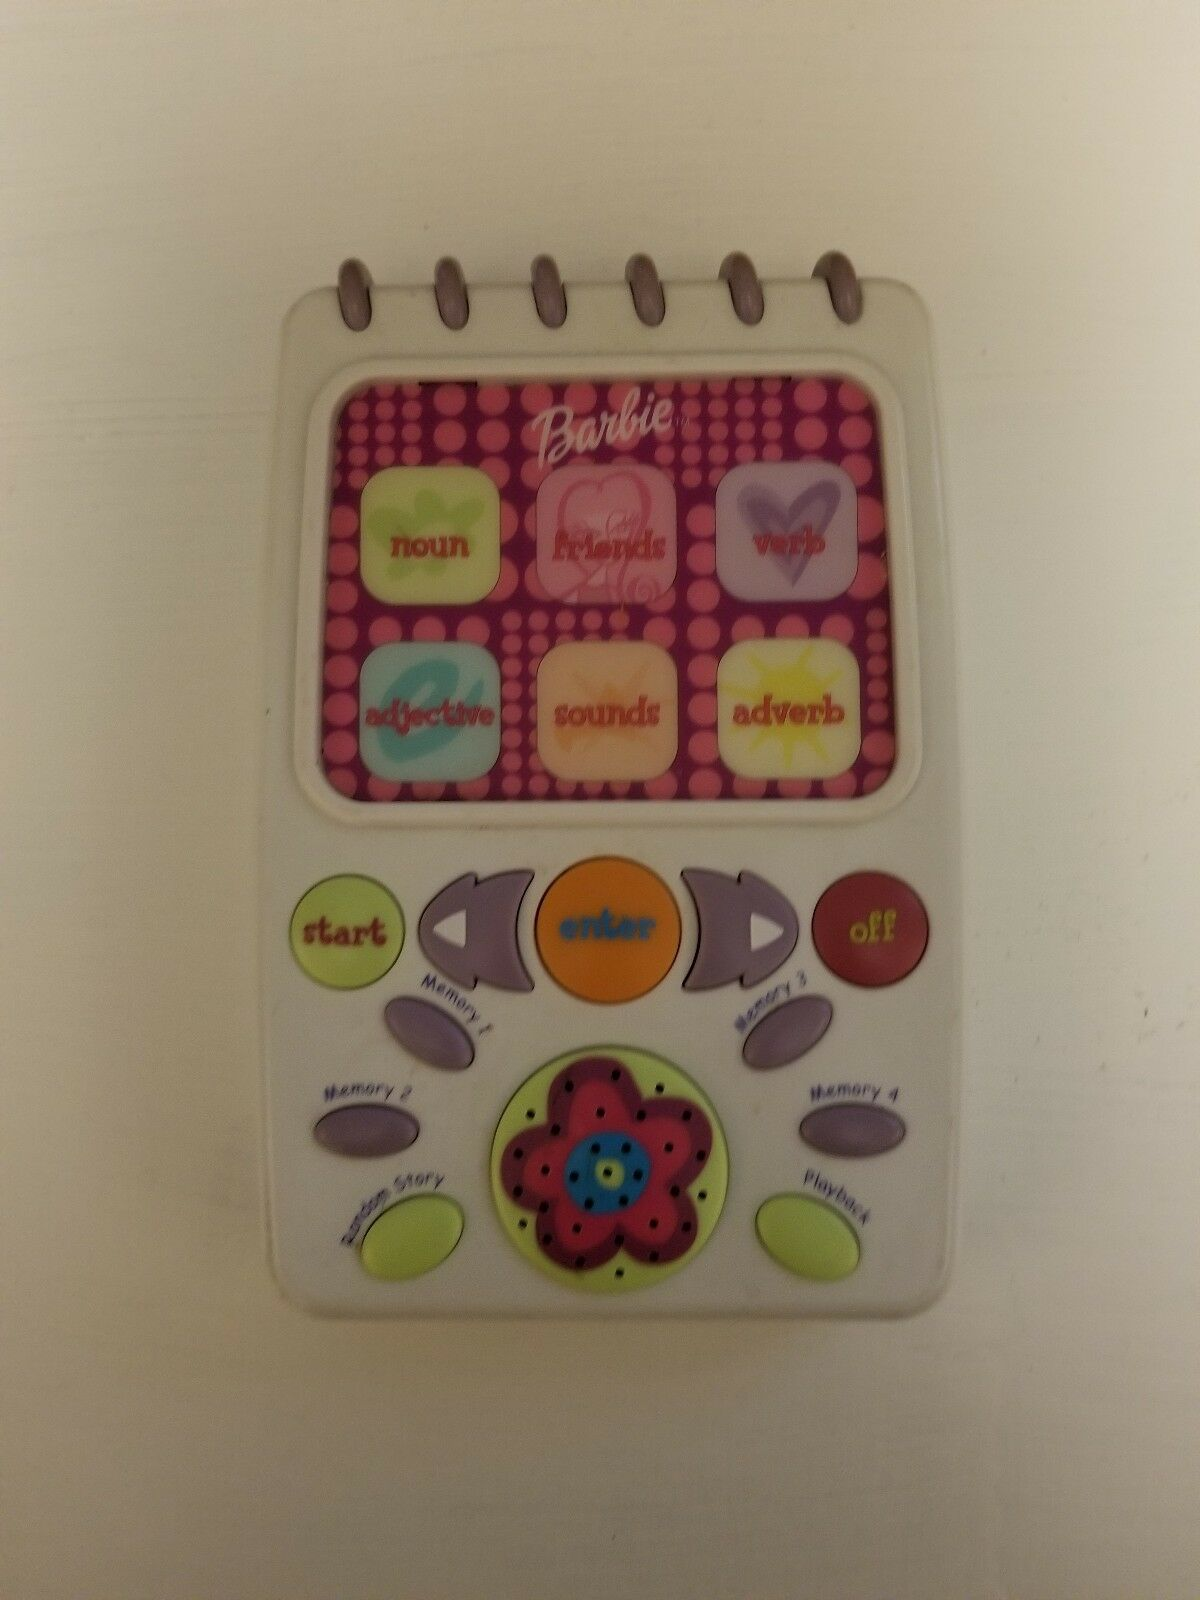 Barbie Mattel KidDesigns Educational Learning Language Arts Handheld Battery...